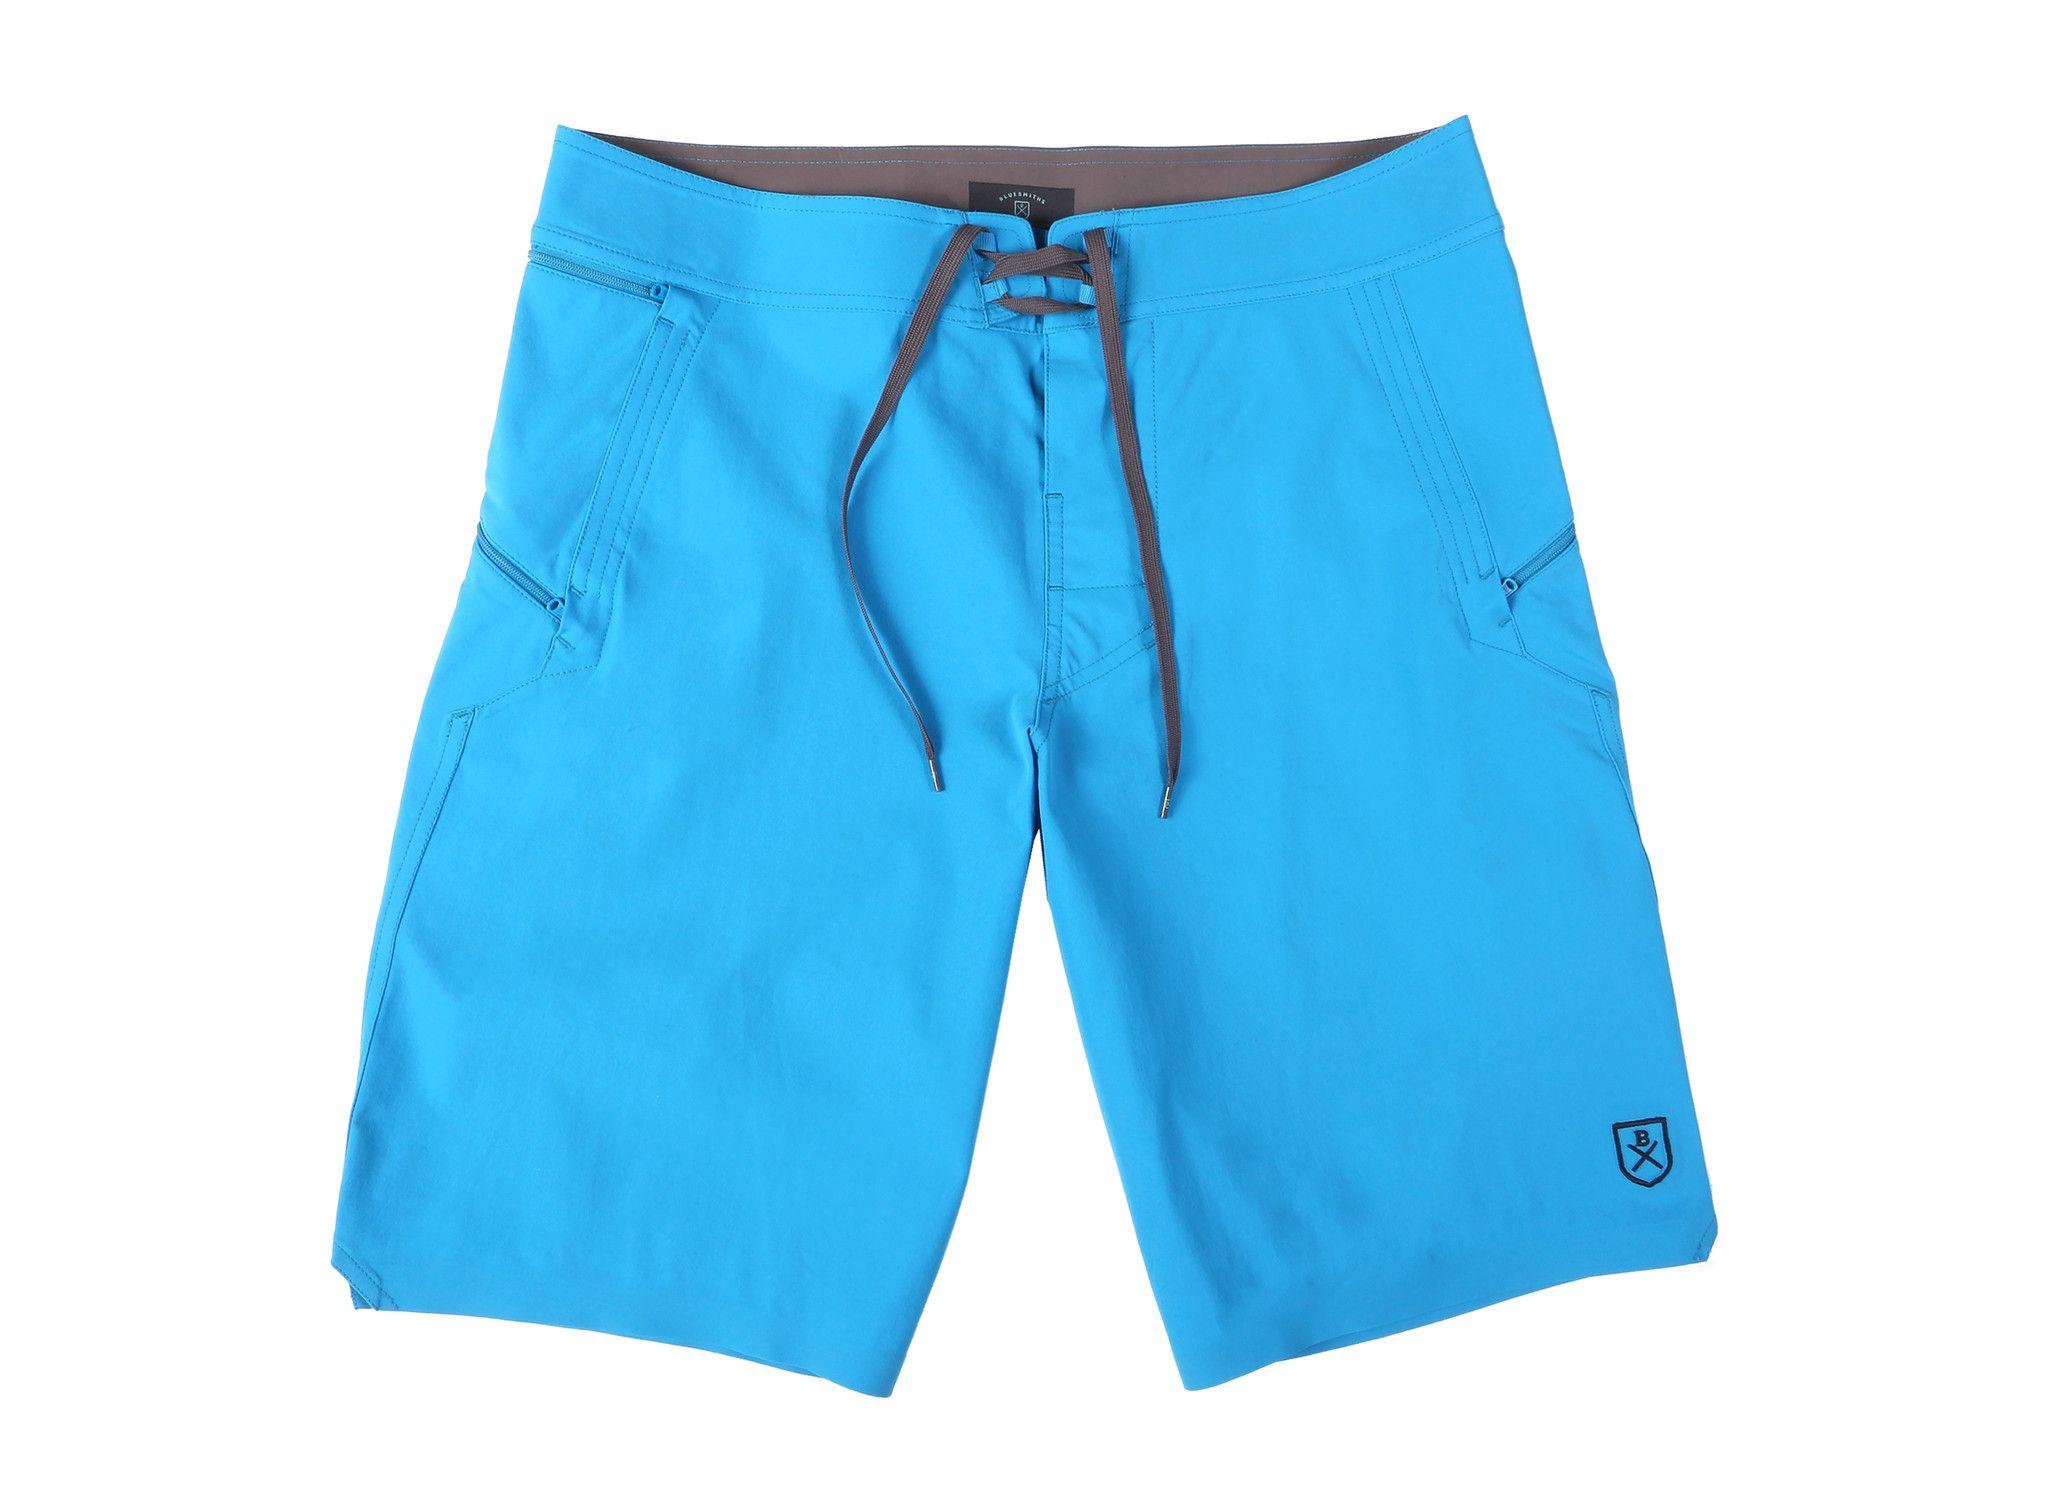 390925879f The Spartan Board Shorts in Hawaiian Ocean | BLUESMITHS